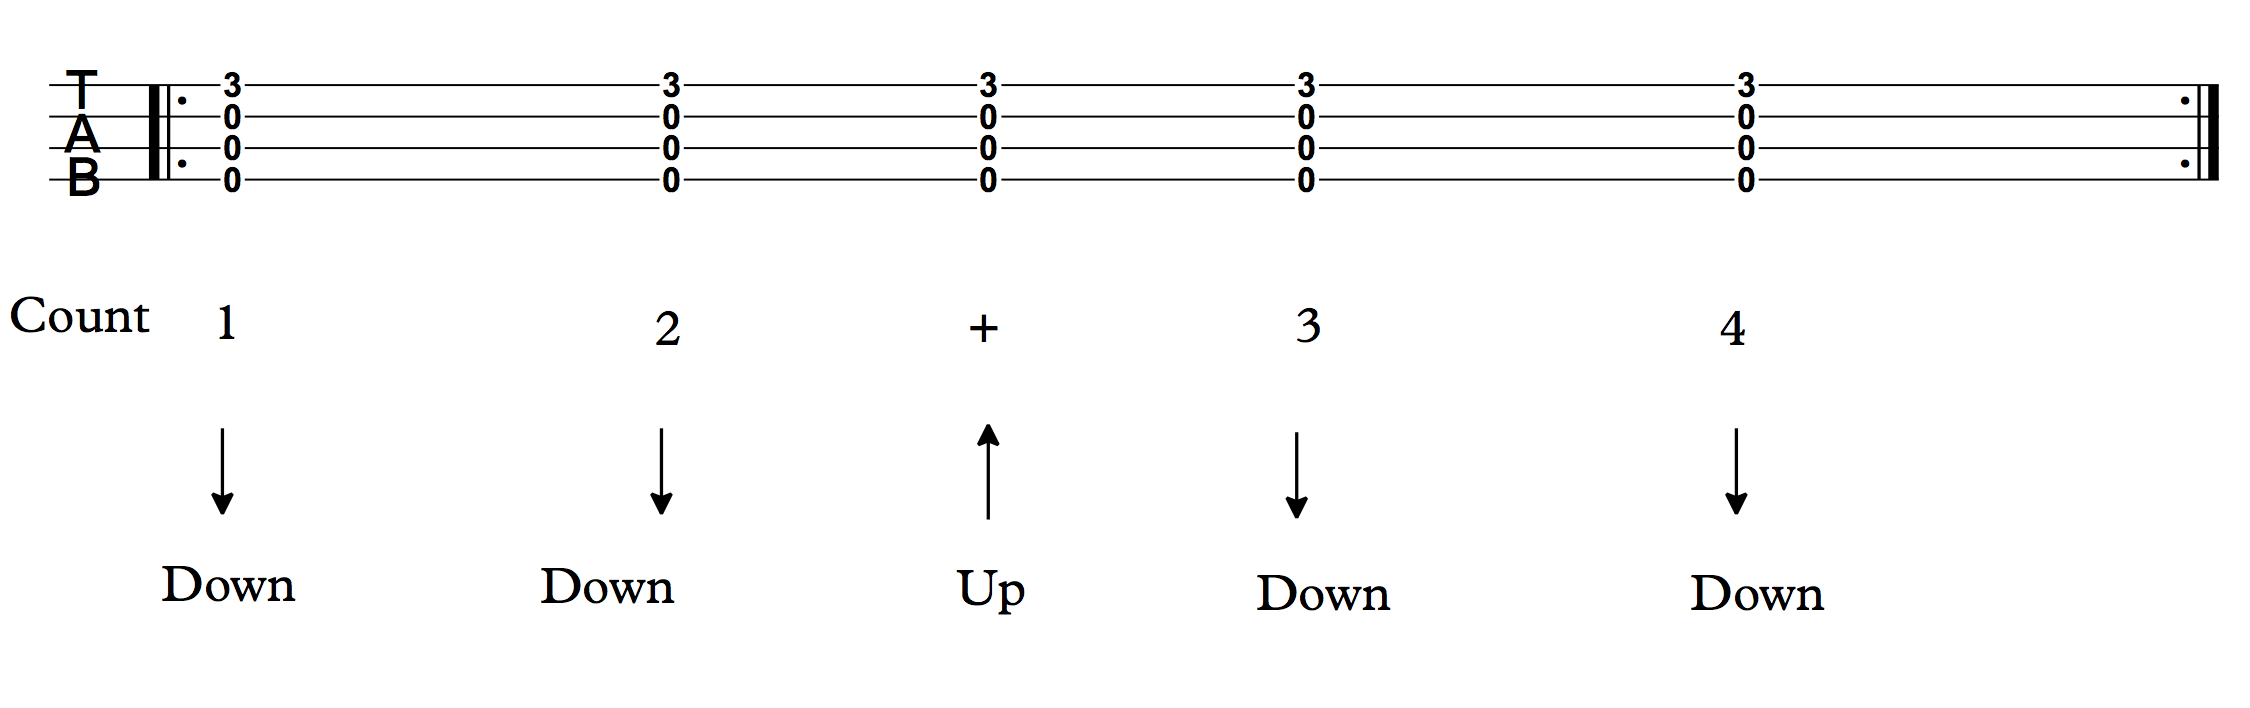 Stum Pattern 2